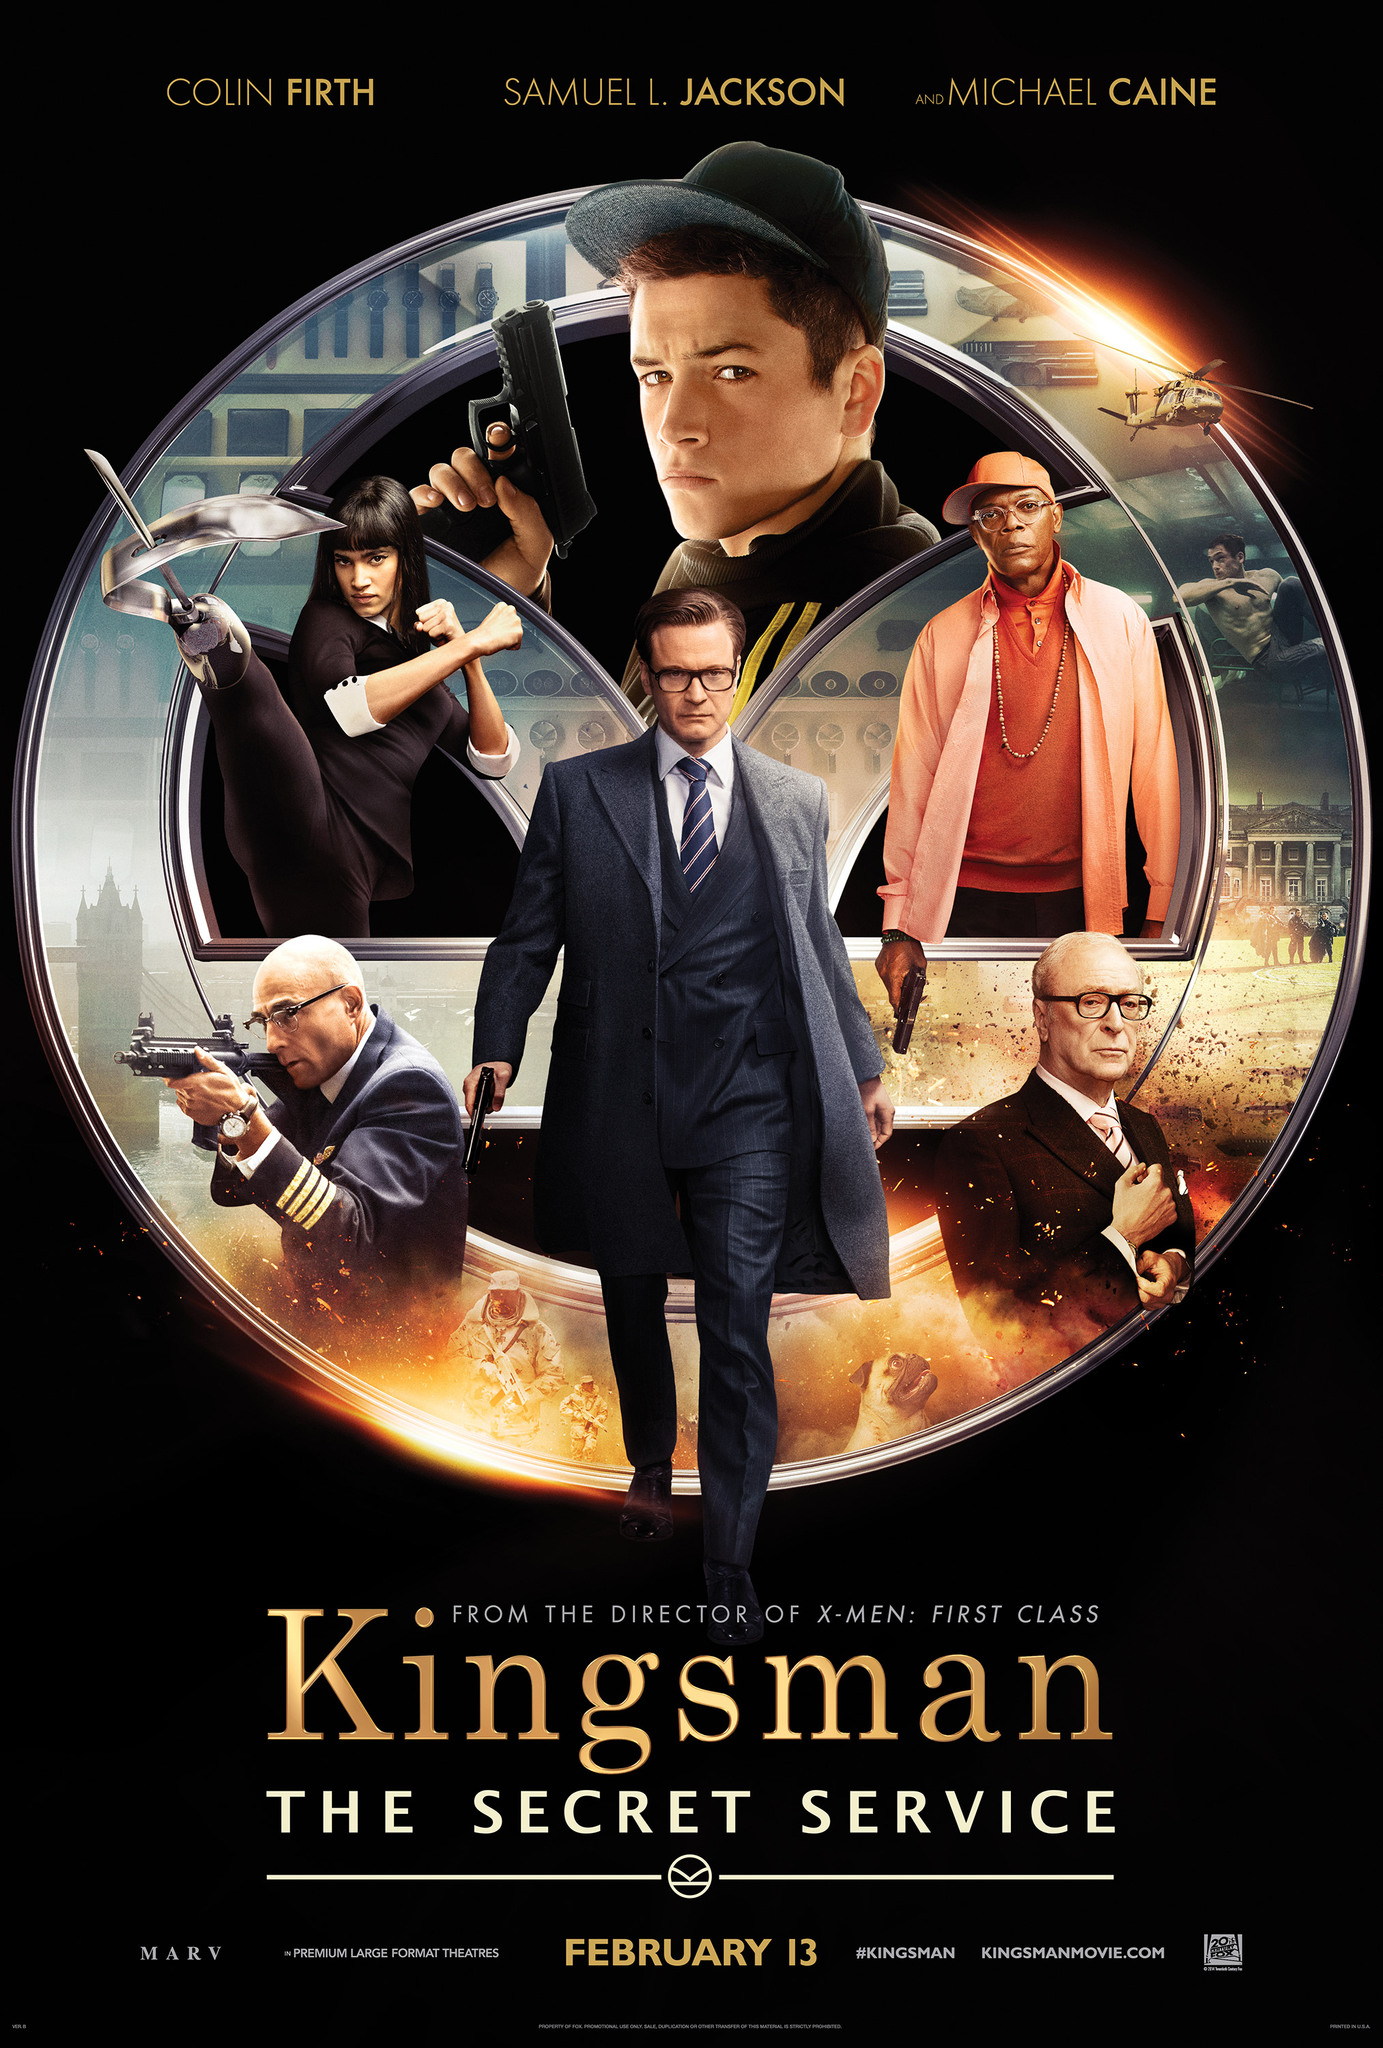 Kingsman: The Secret Service full movie streaming